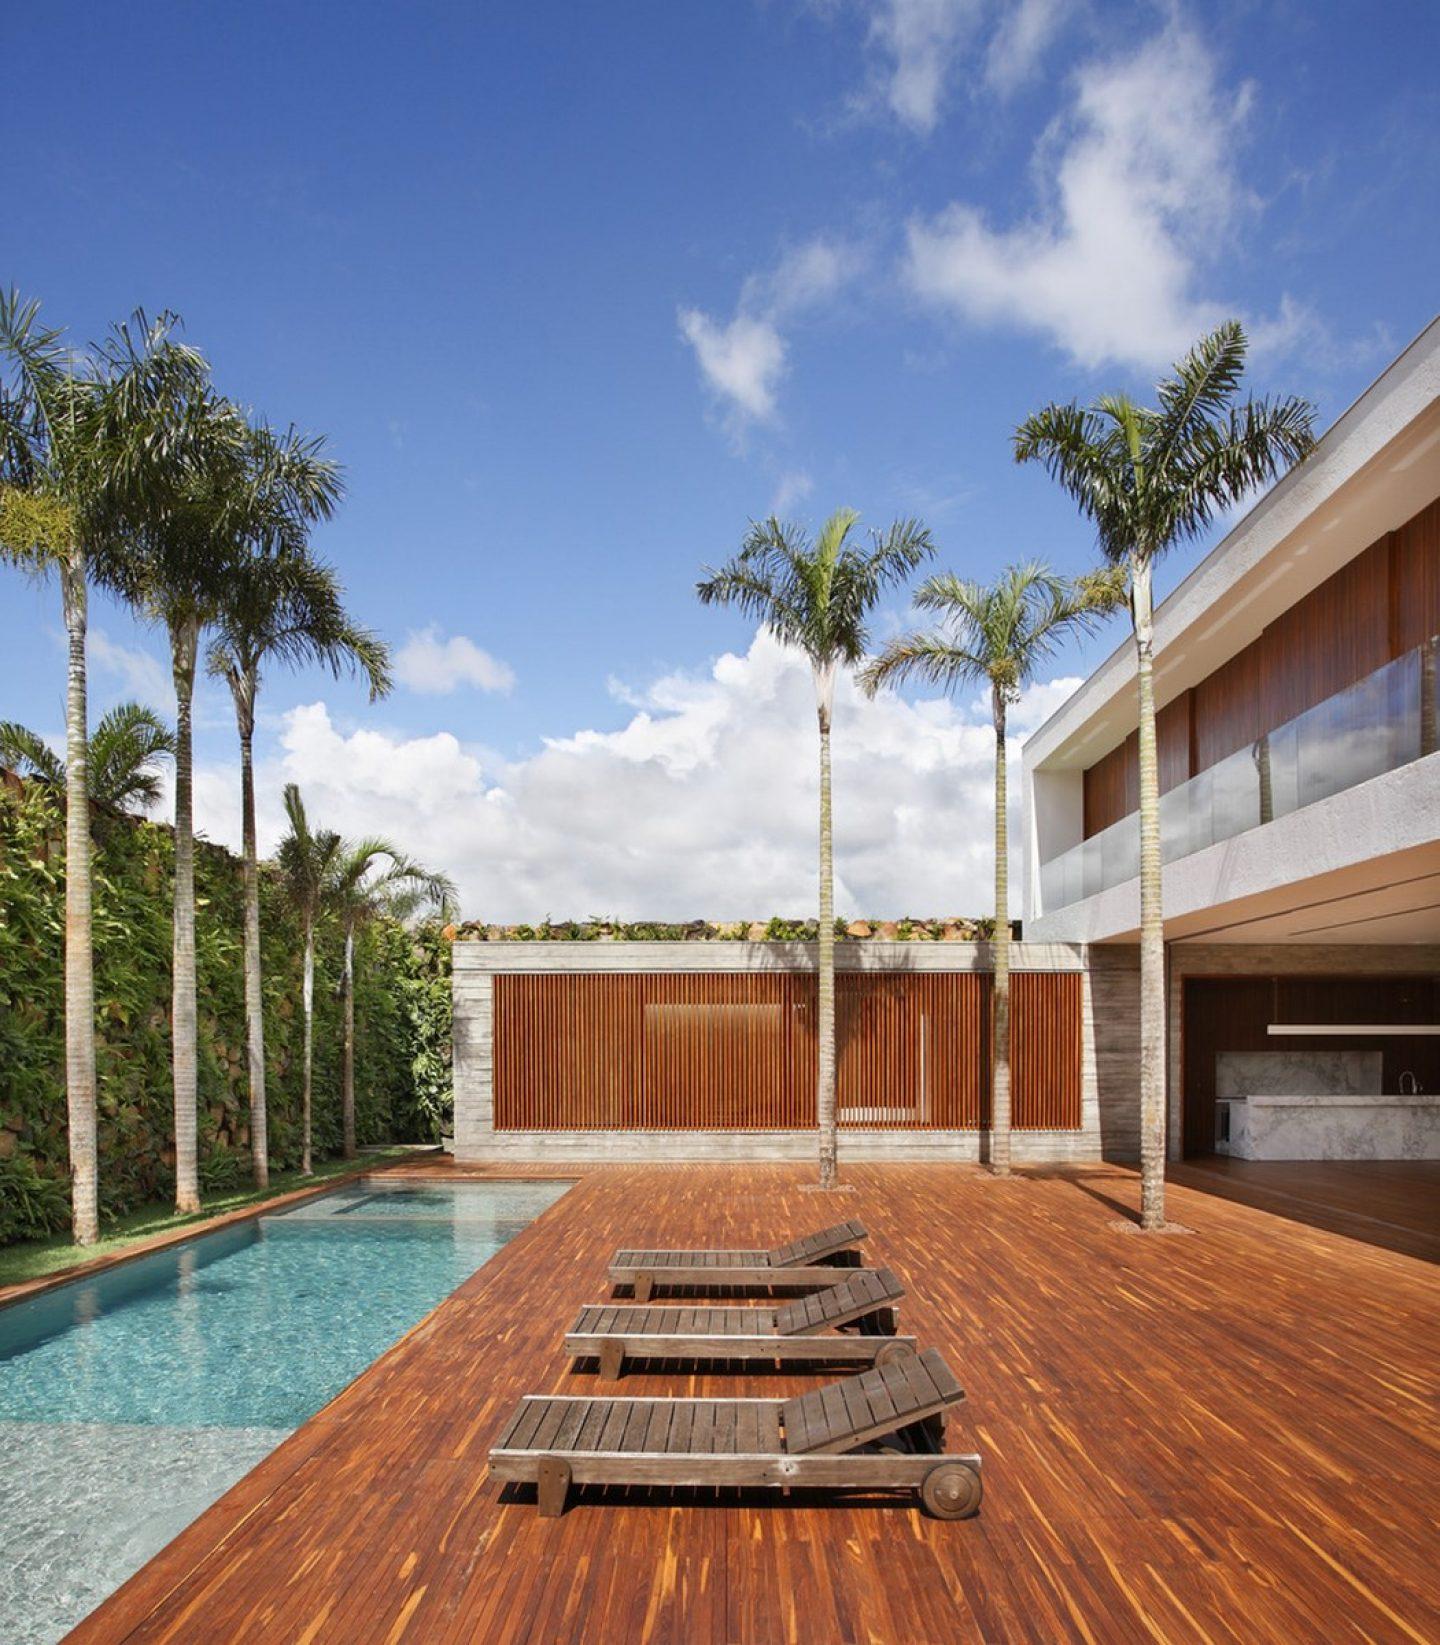 Guilherme_Torres_Architecture (19)